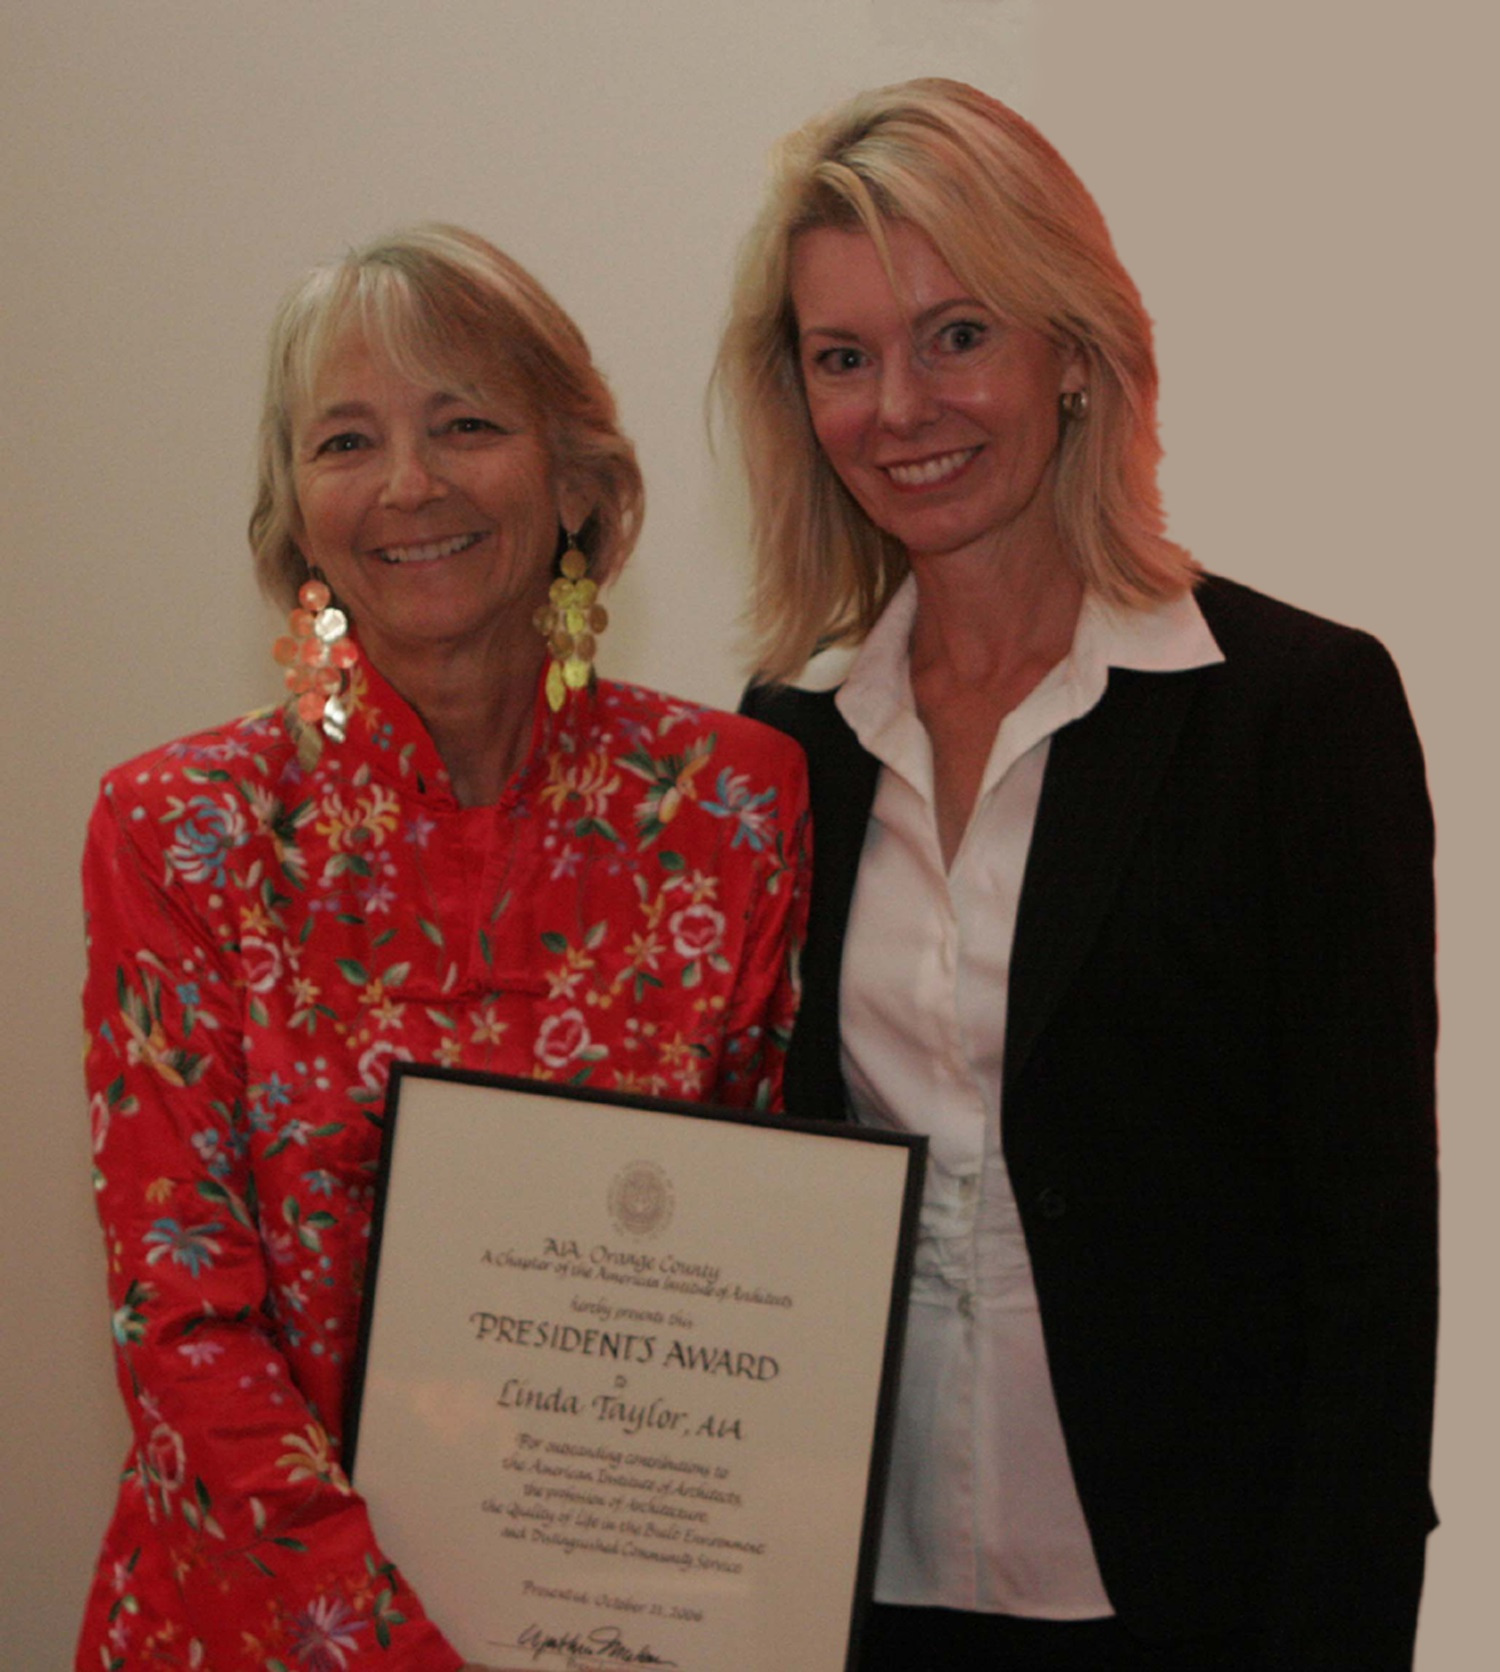 Linda Taylor AIAOC President's Award